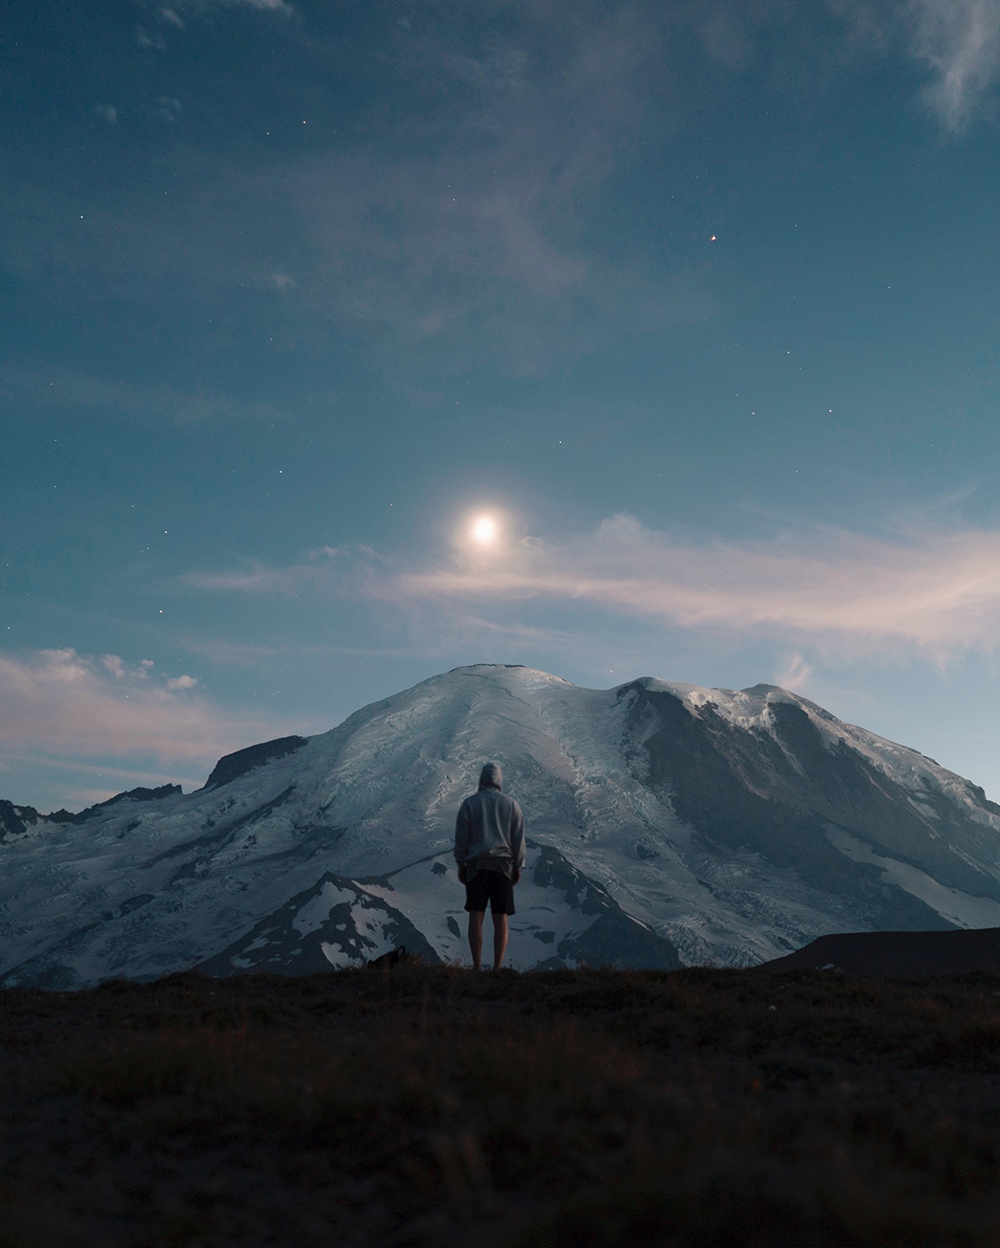 Mount Rainier National Park, United States